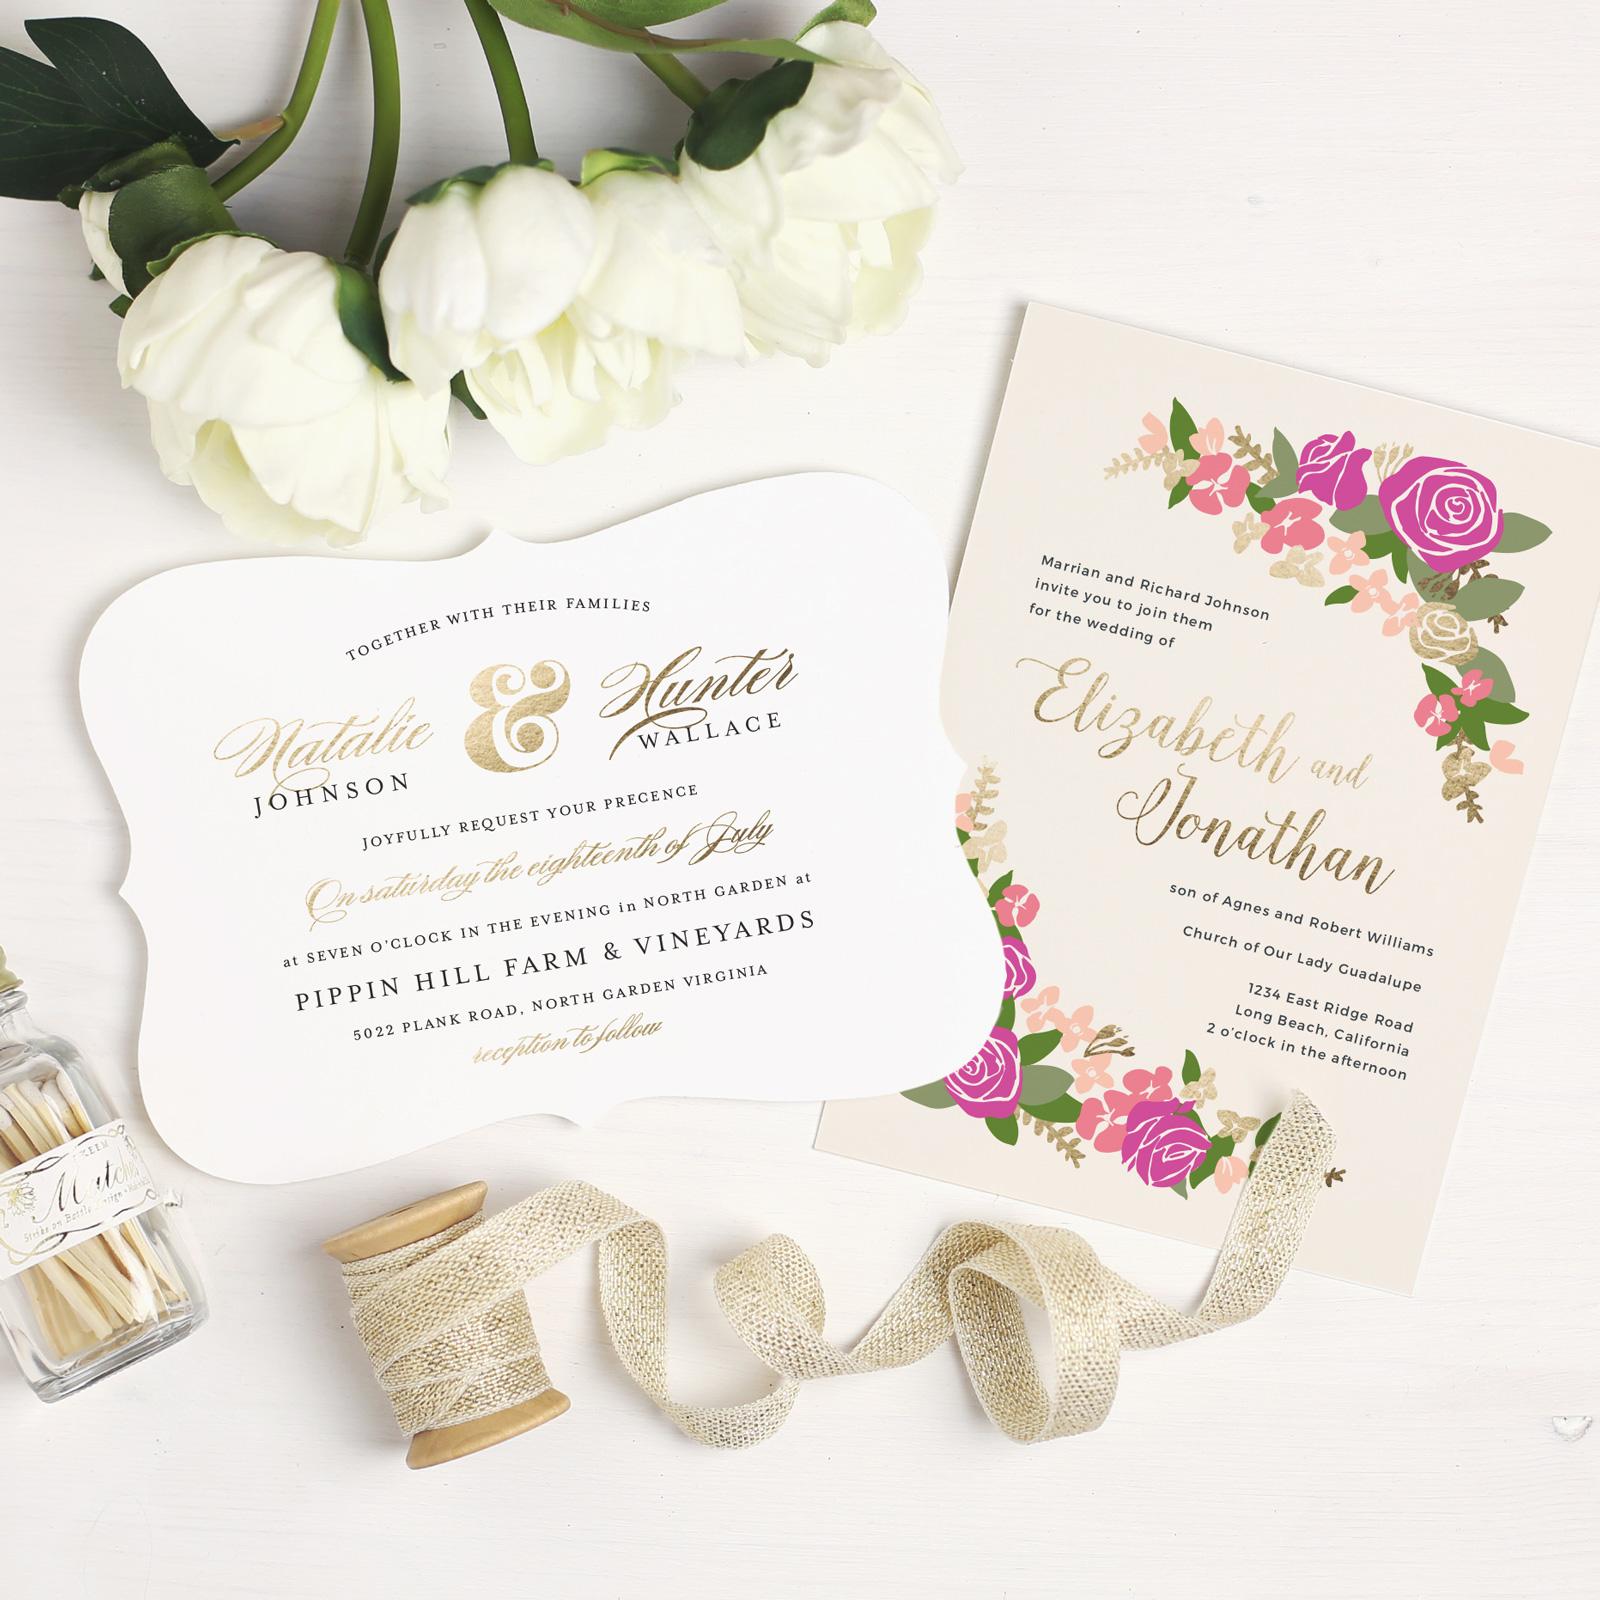 design beautiful wedding invitations online with basic invite wedding invitation online Wedding Invitations Online